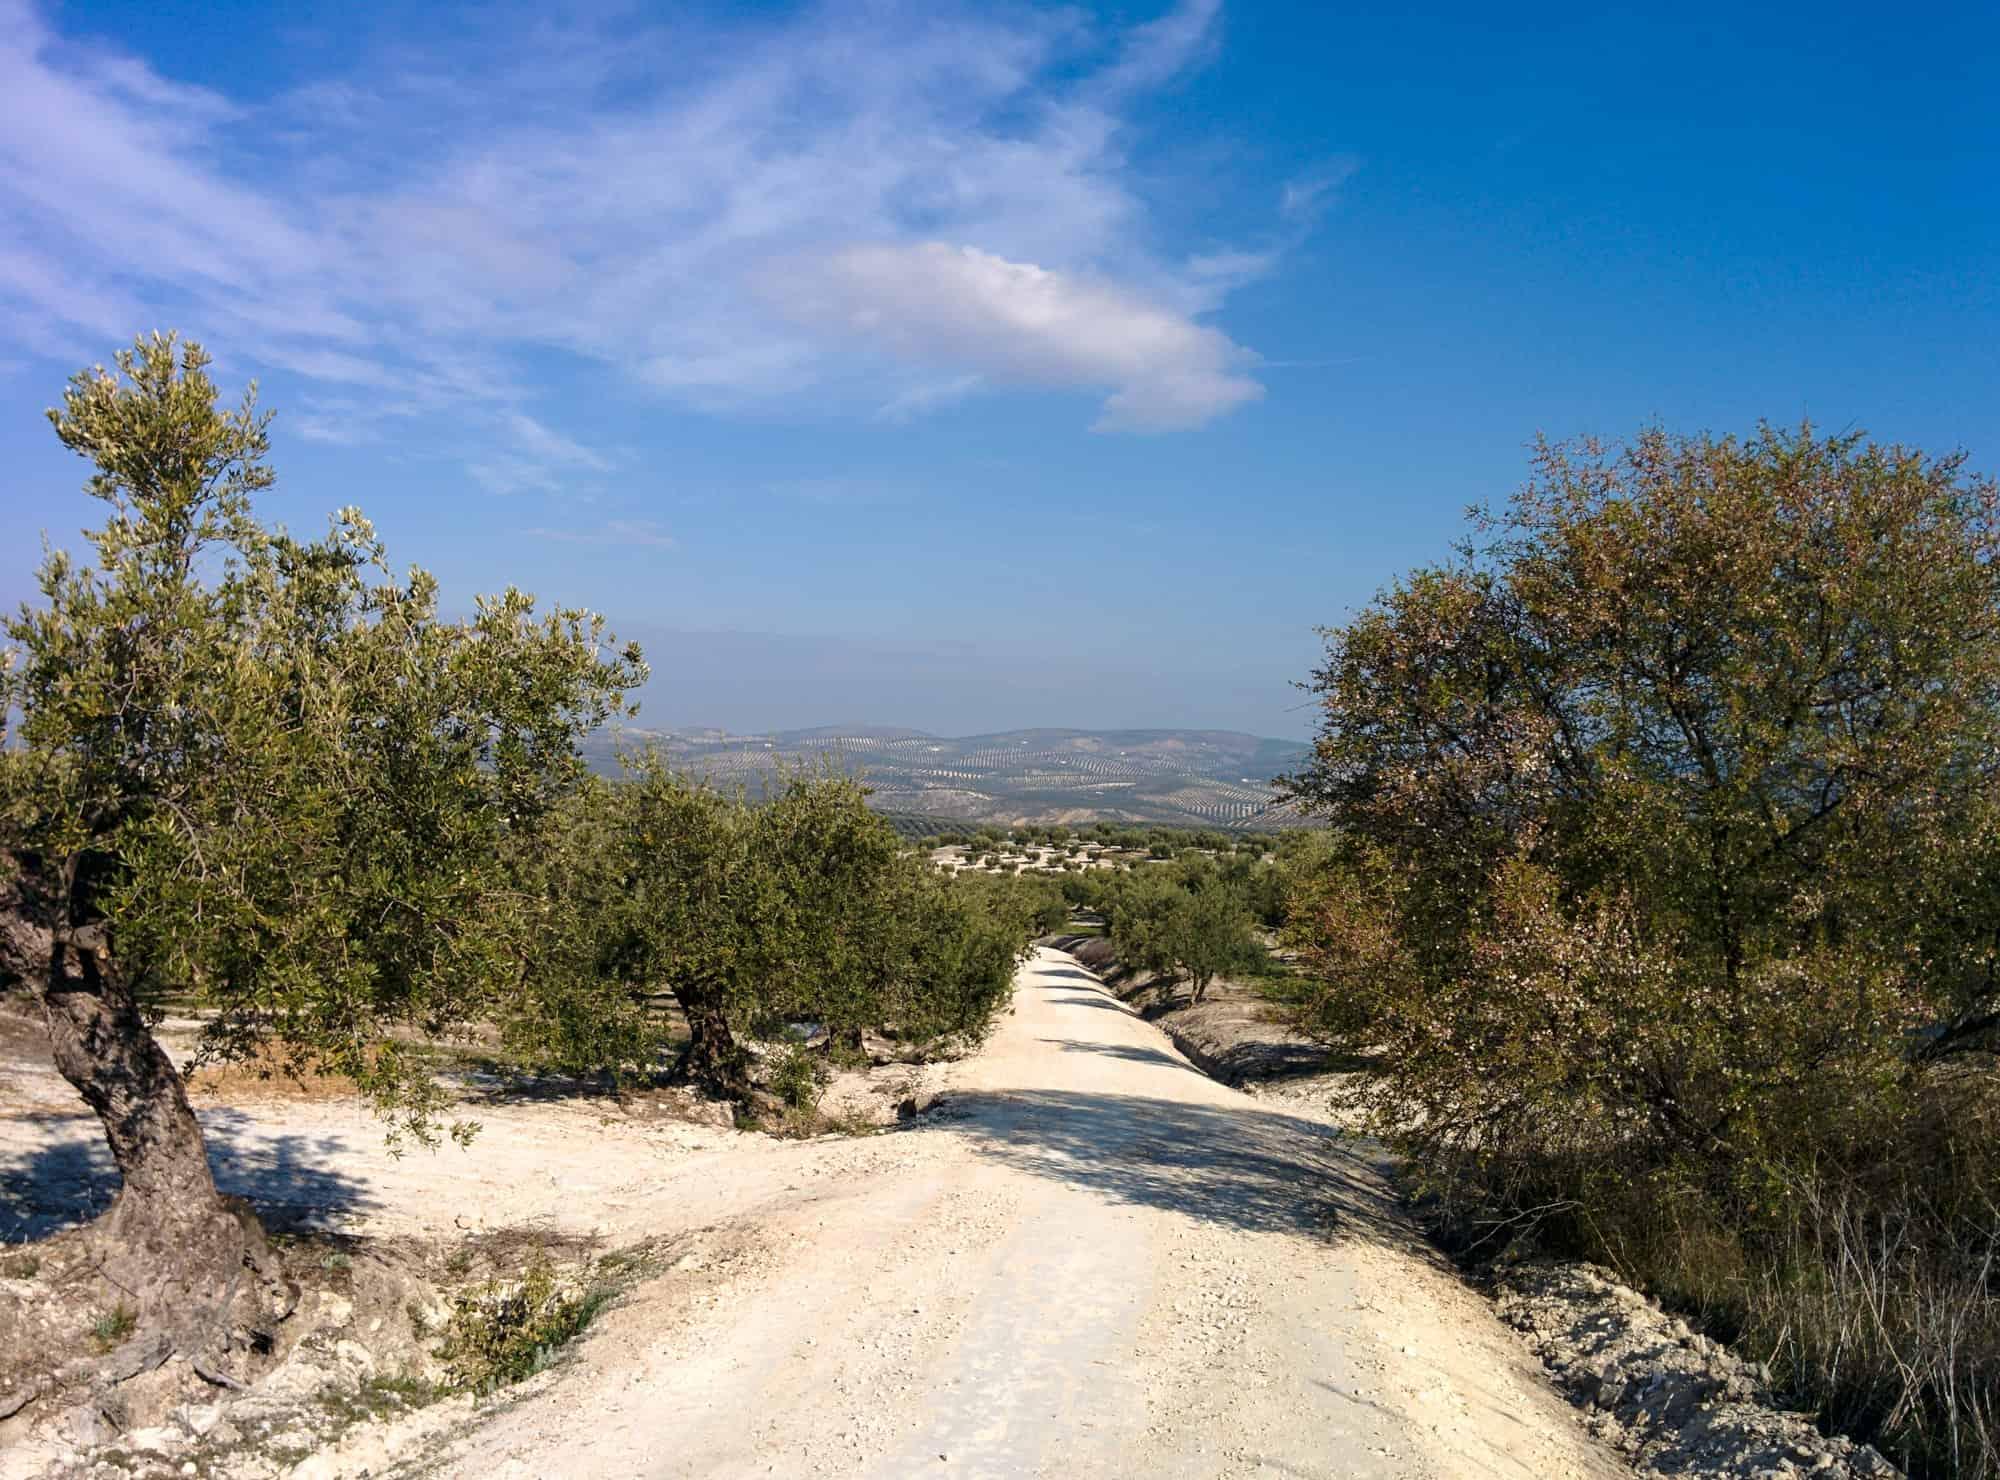 Camino dirt track